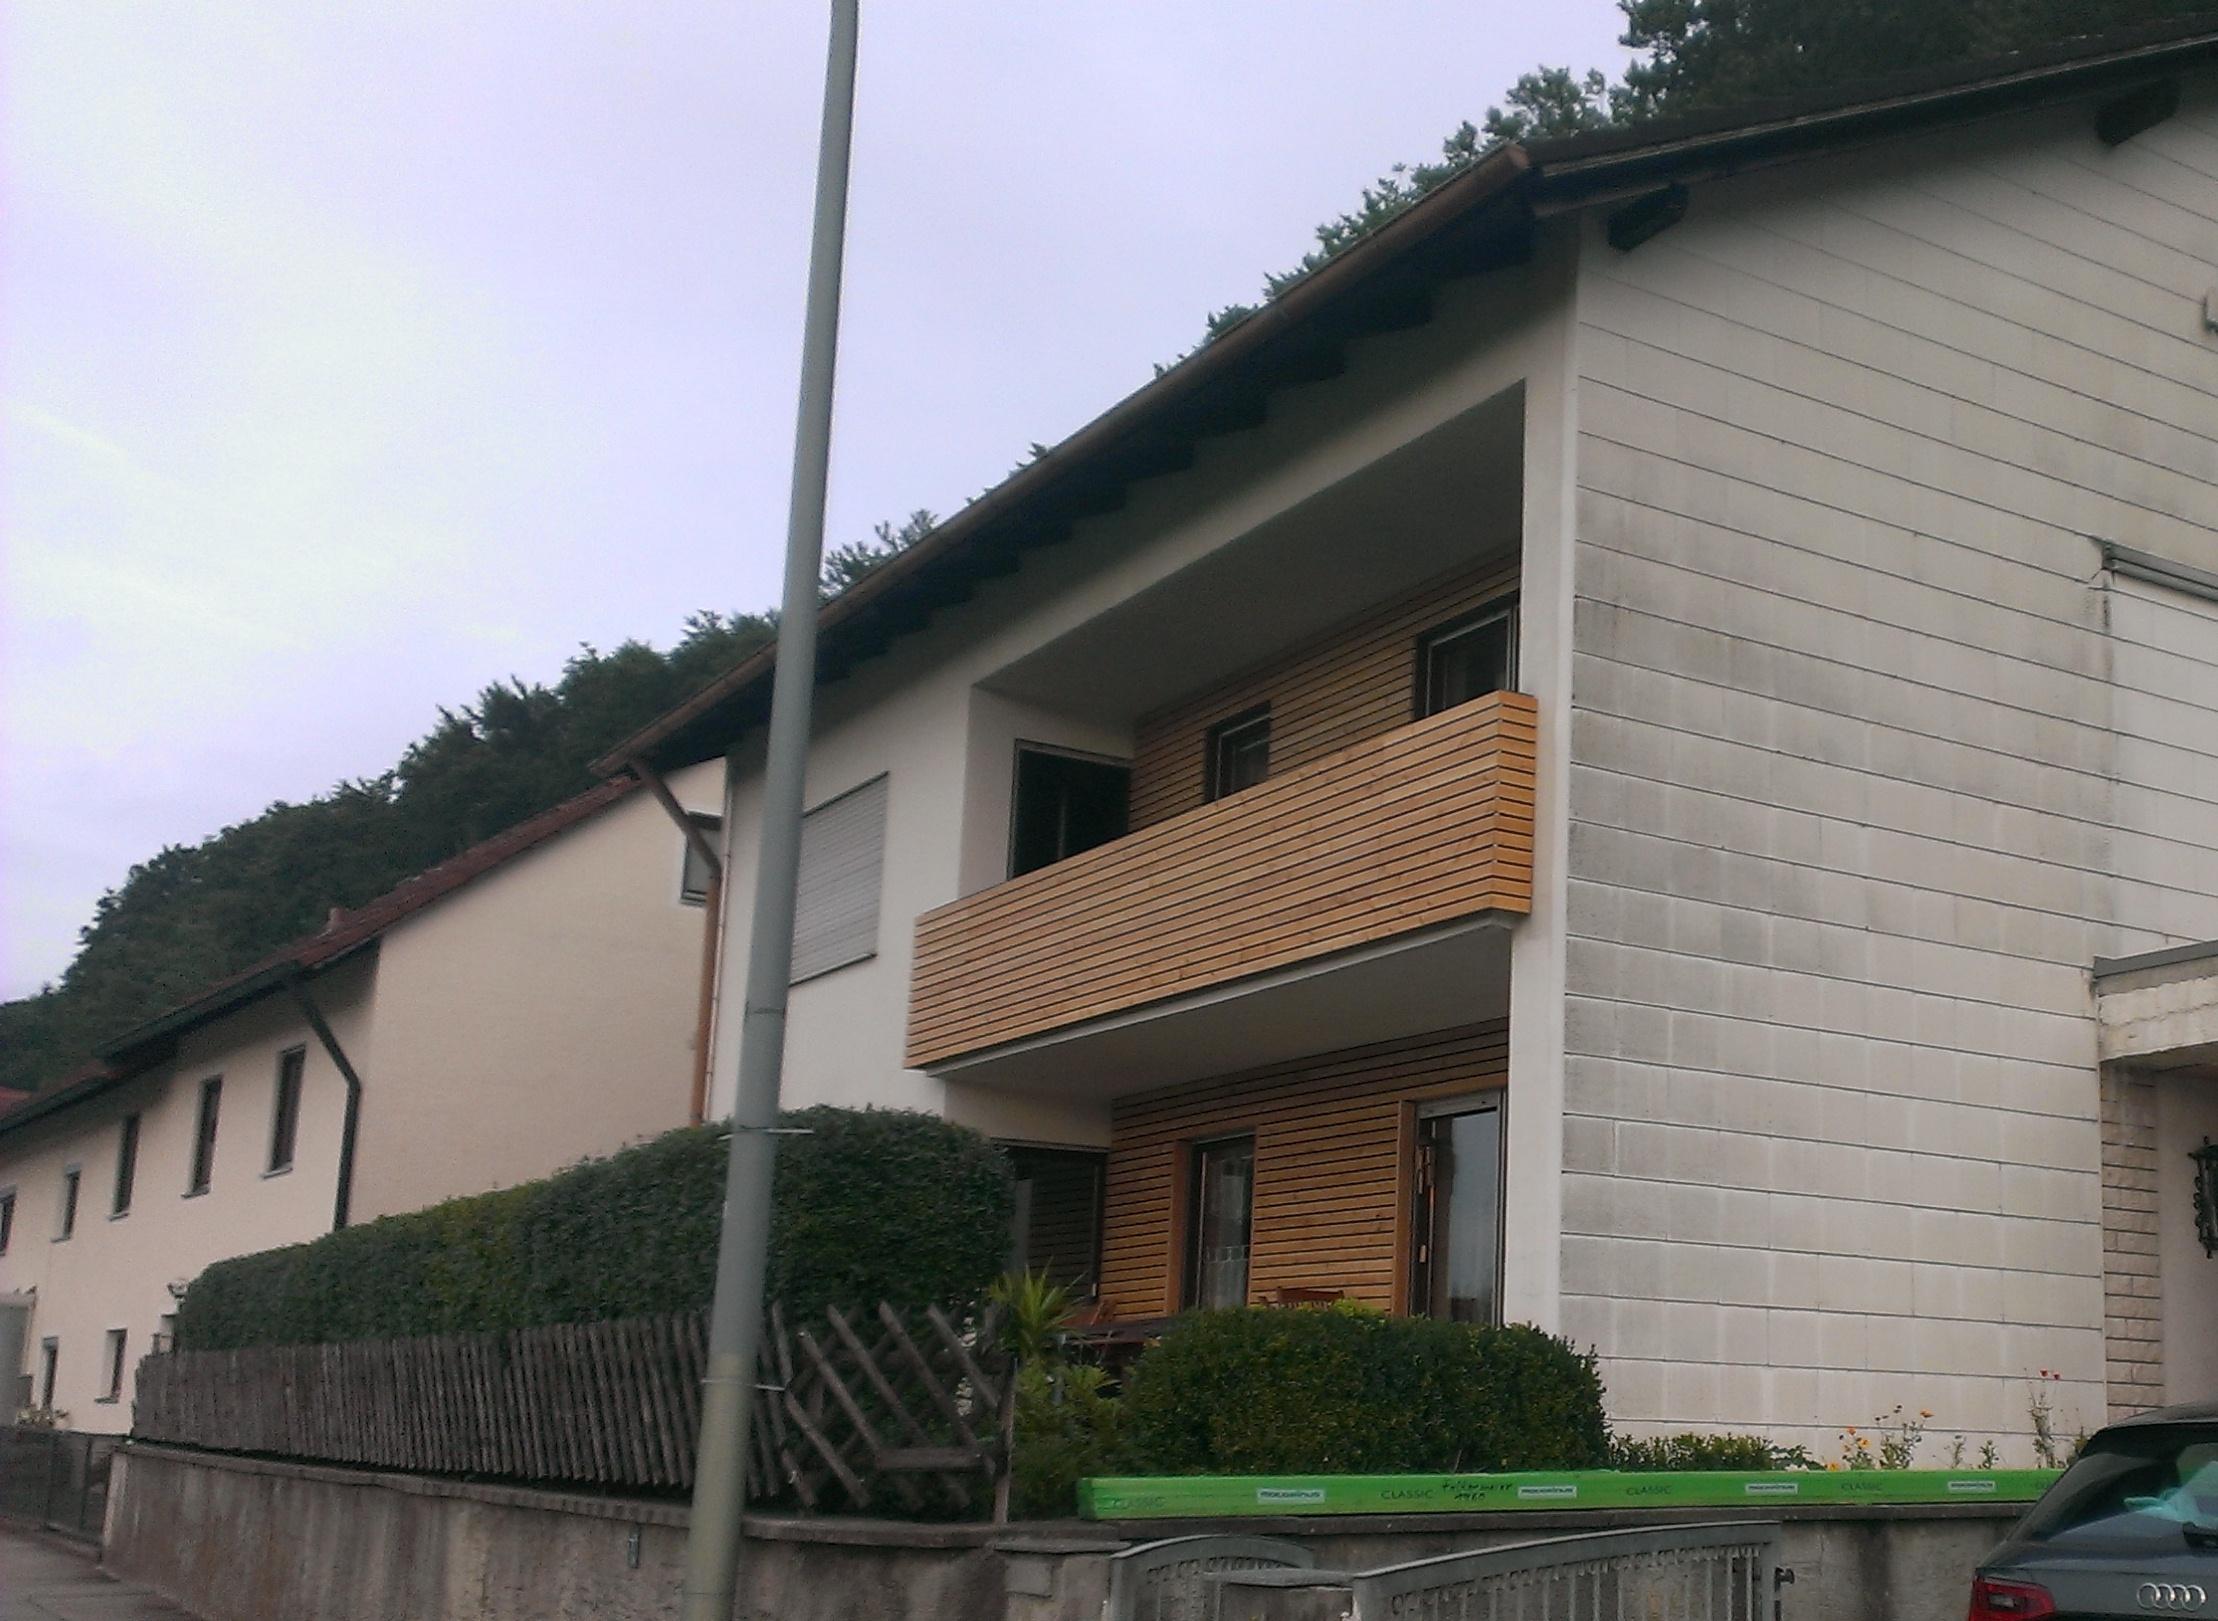 Fassadengestaltung holz  Fassadengestaltung • Bilder & Ideen • COUCHstyle